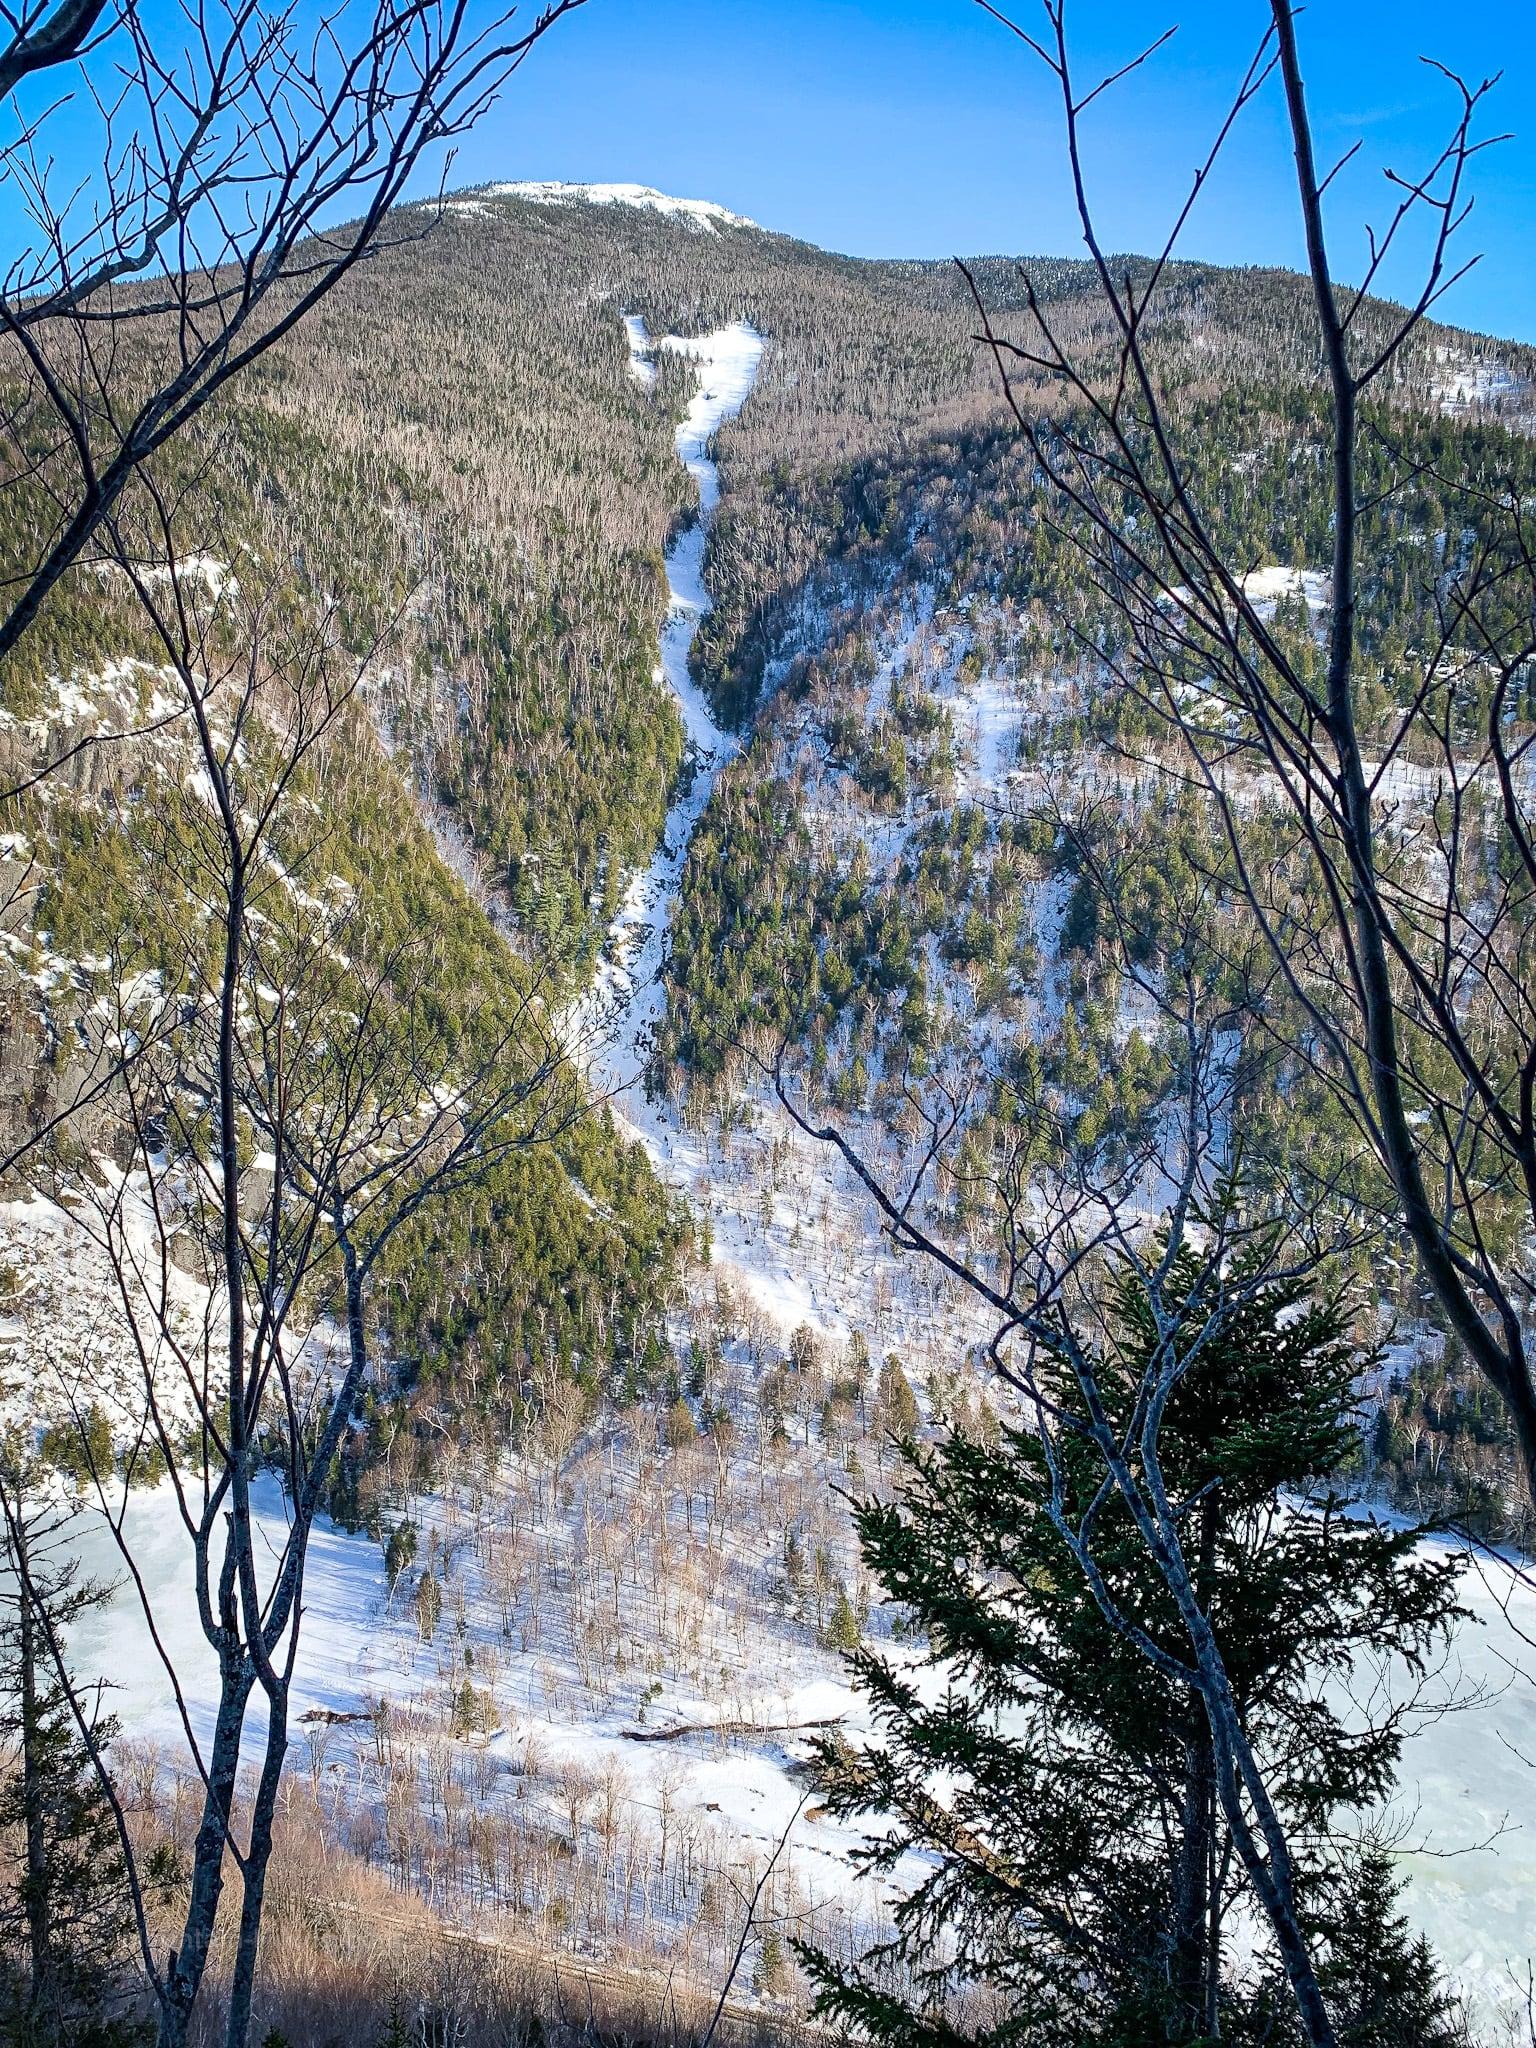 snowy mountain slope